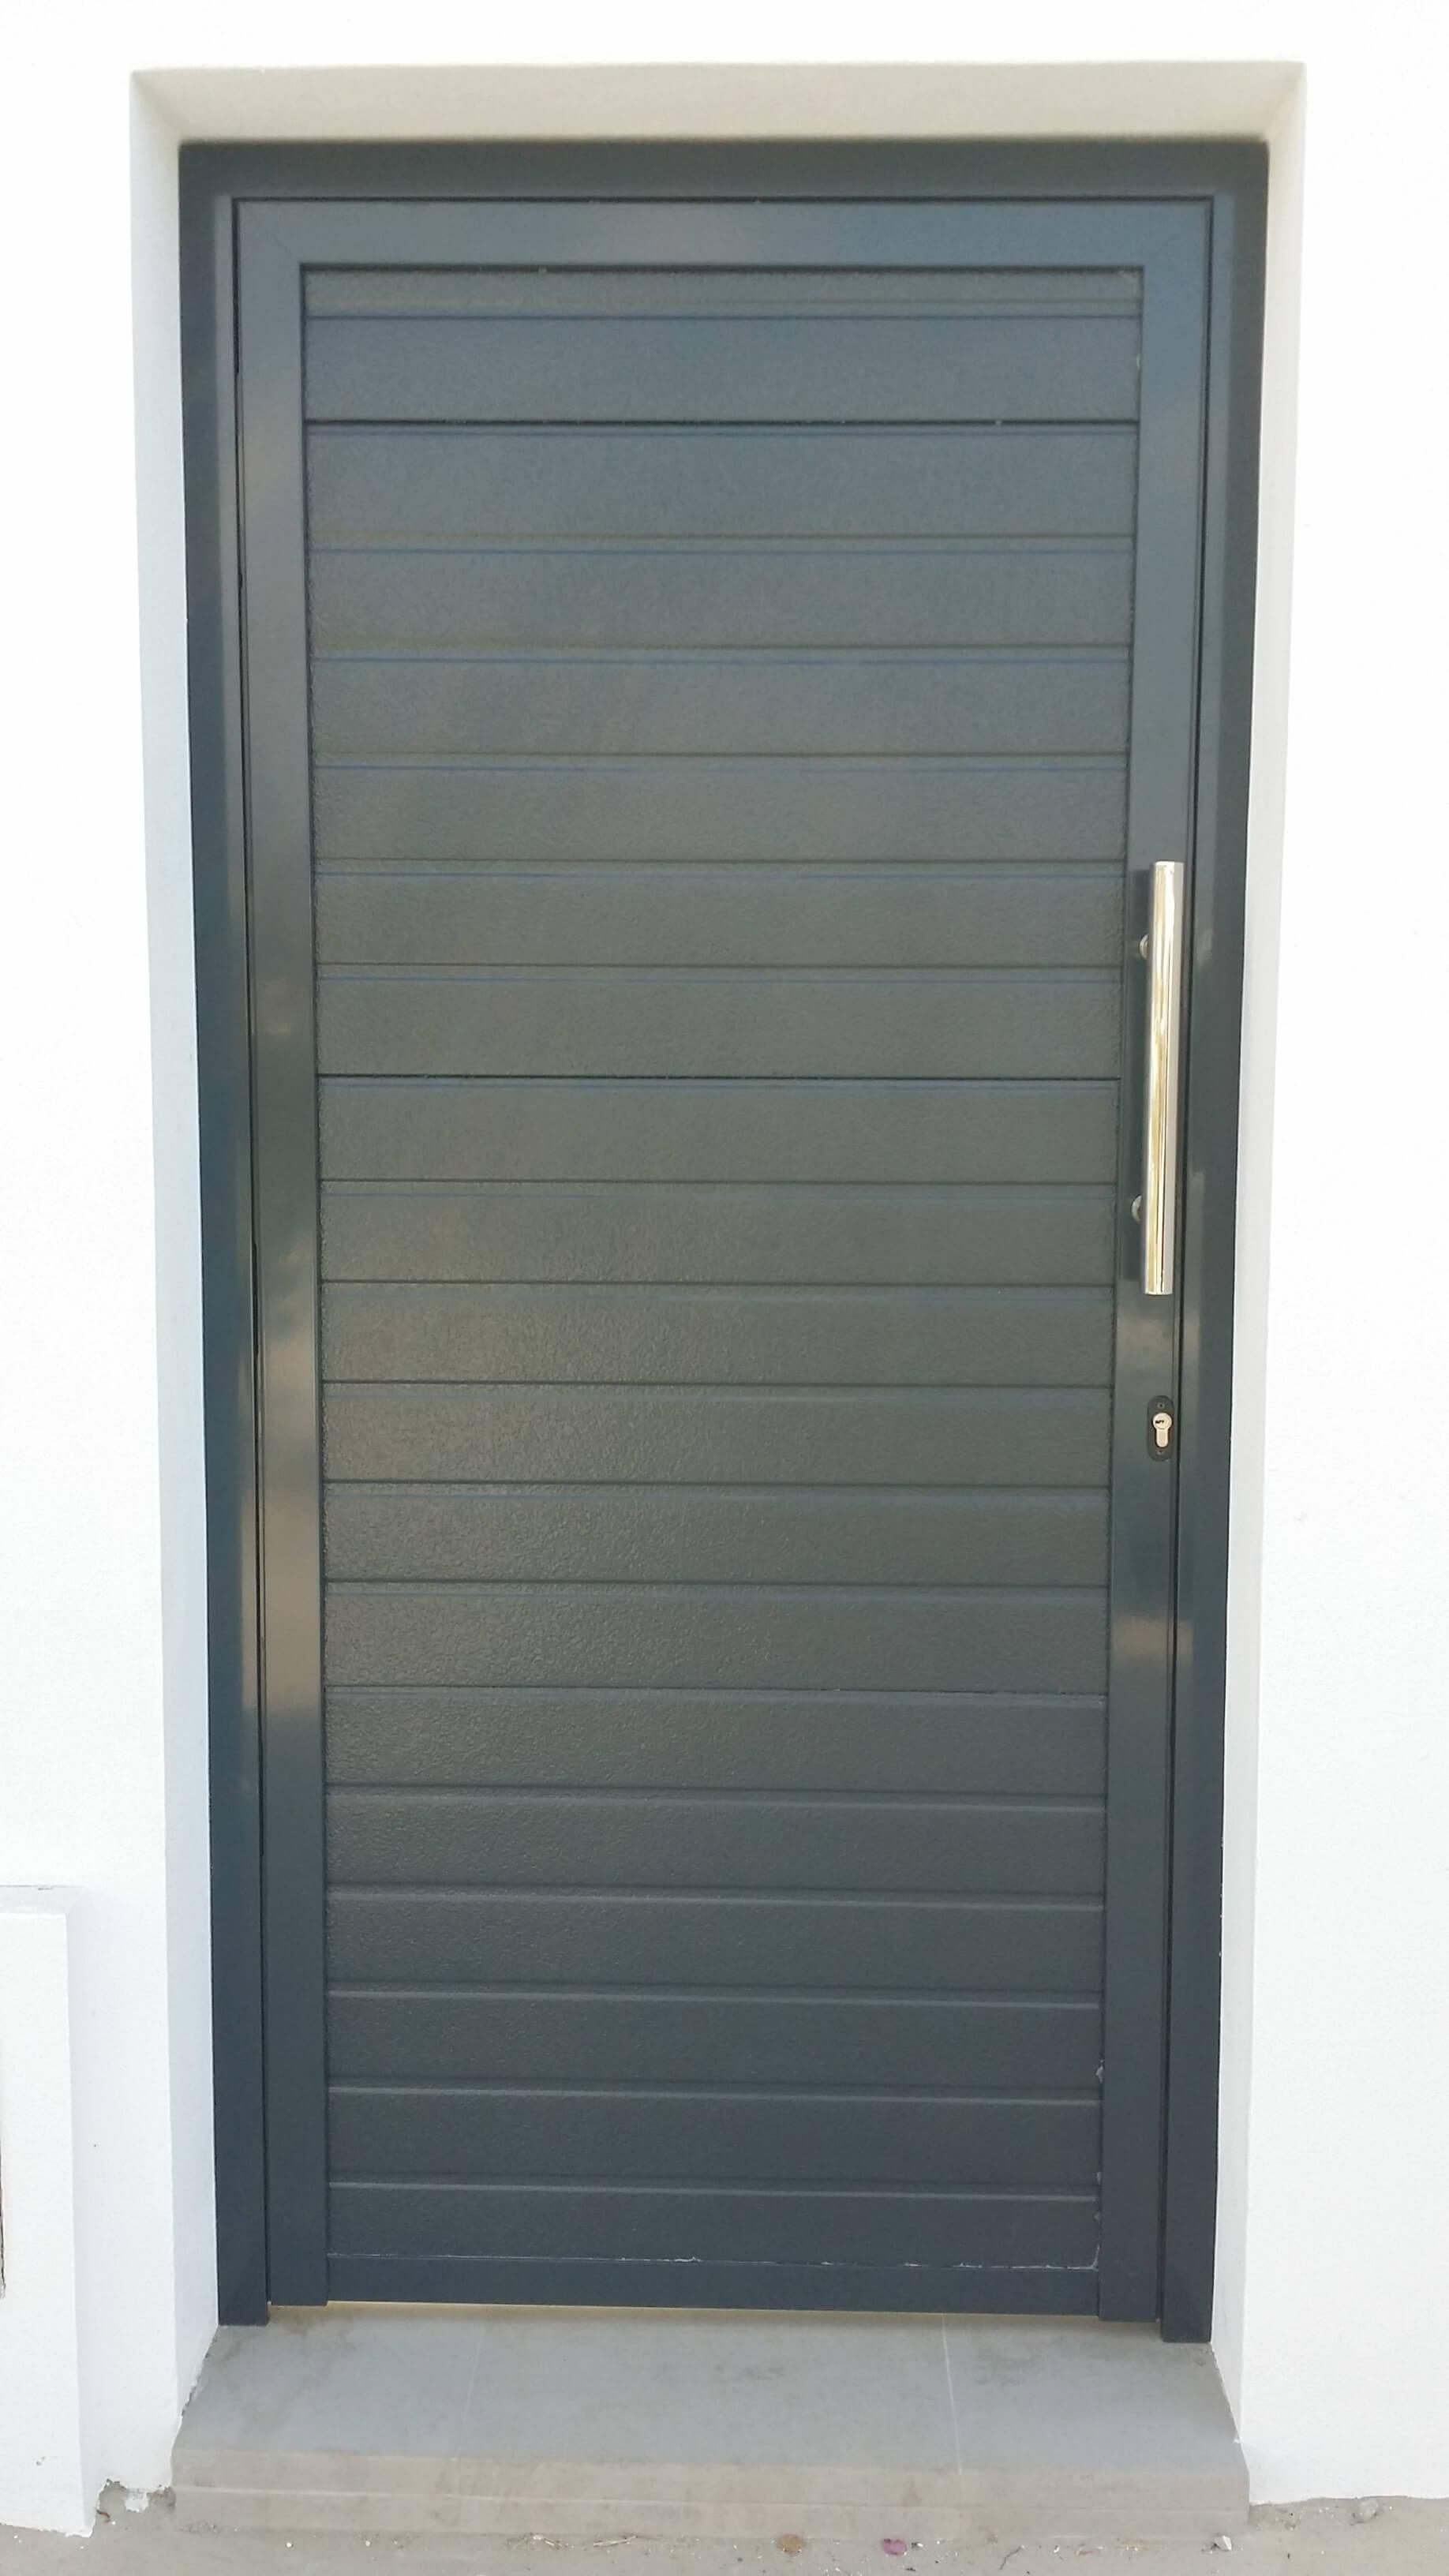 Puerta peatonal con paneles seccionales